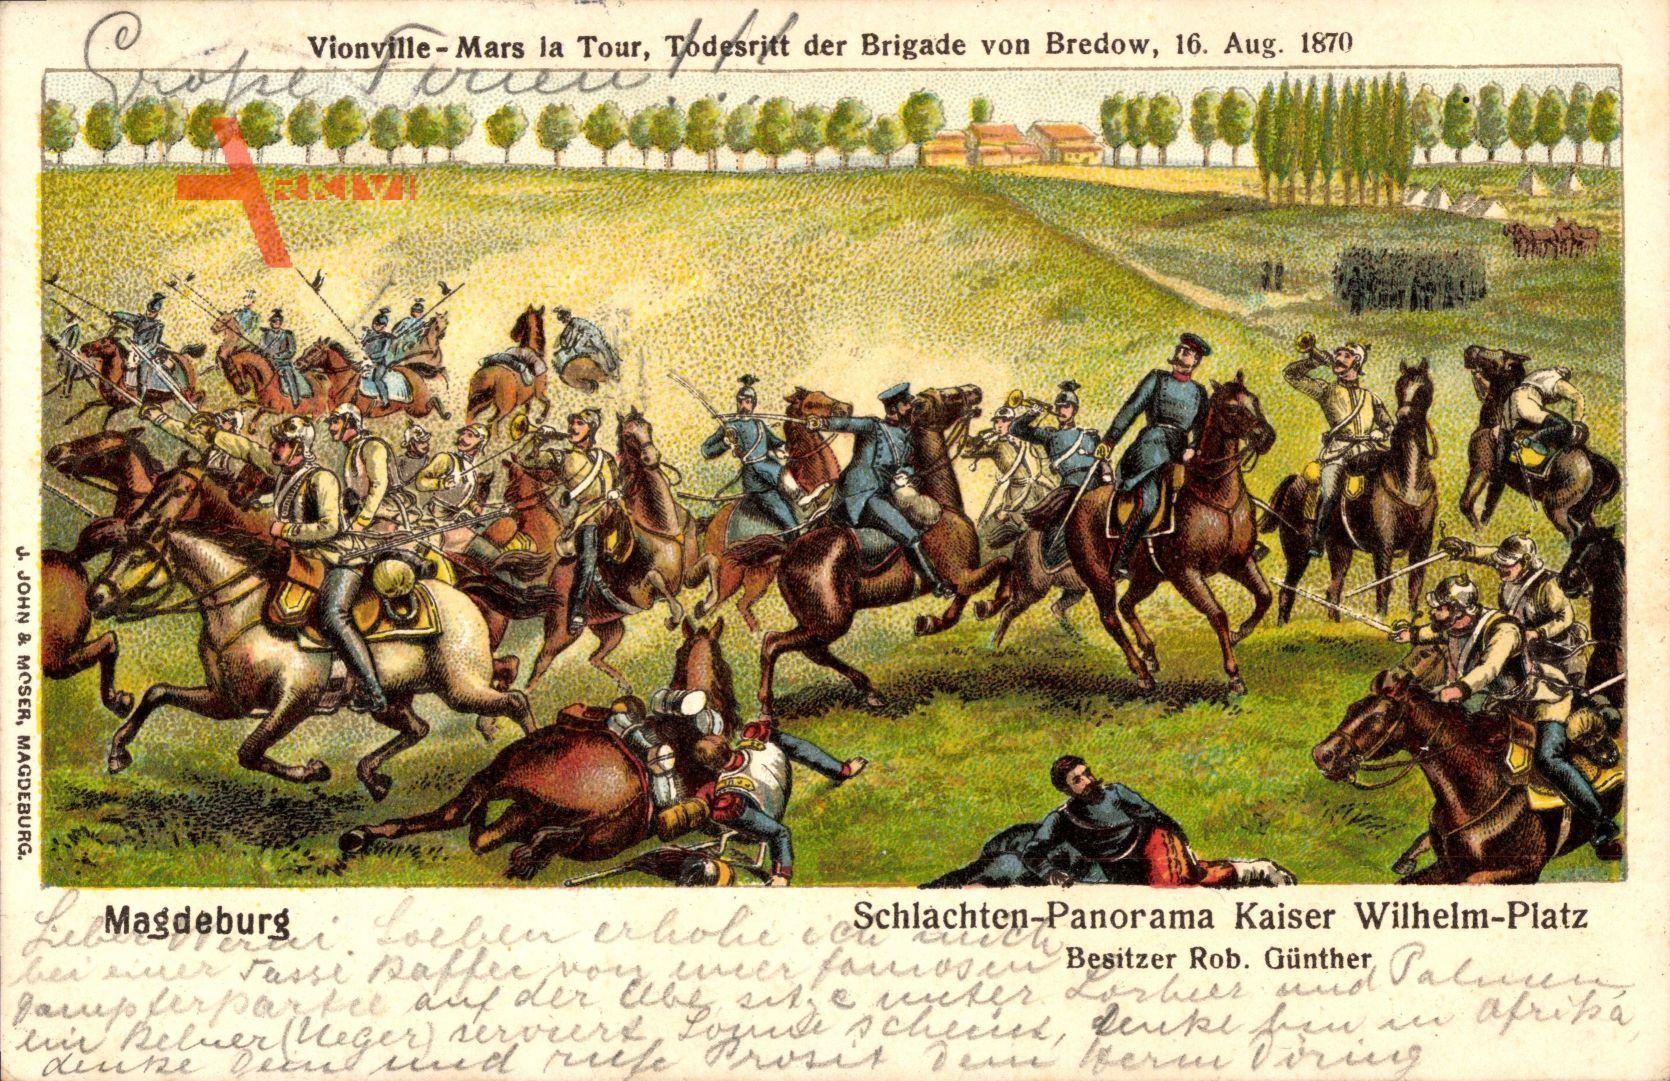 Magdeburg, Schlachtenpanorama Kaiser Wilhelm Platz, Bredow, Todesritt 1870